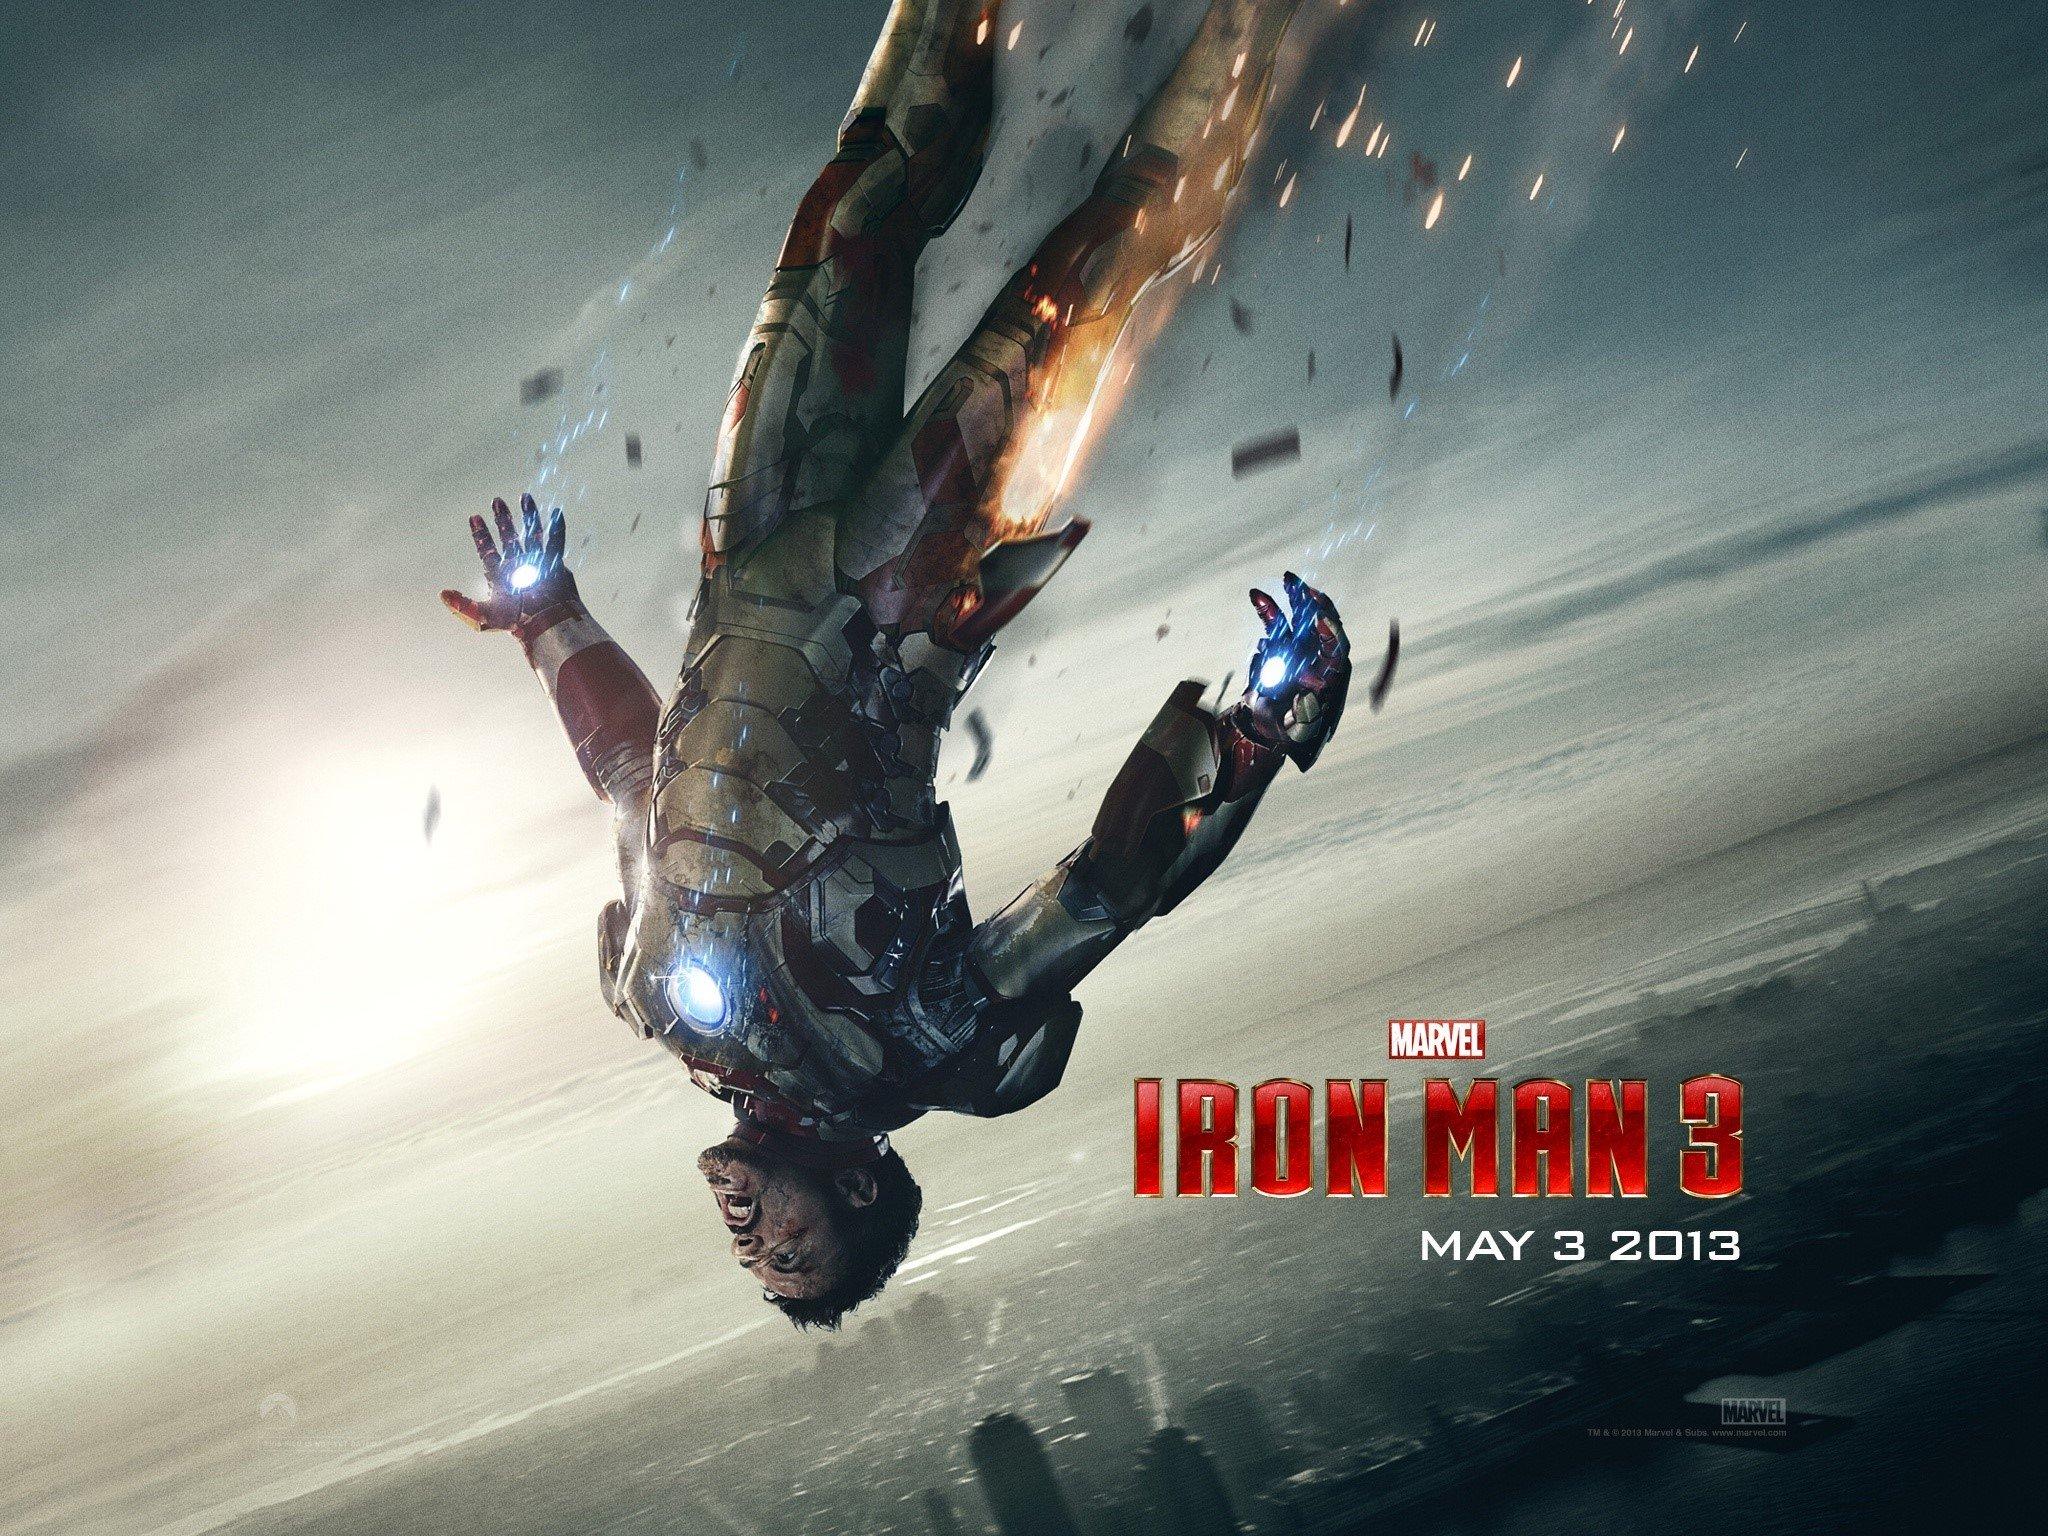 Tony Stark En Iron Man 3 Fondo De Pantalla Id1204